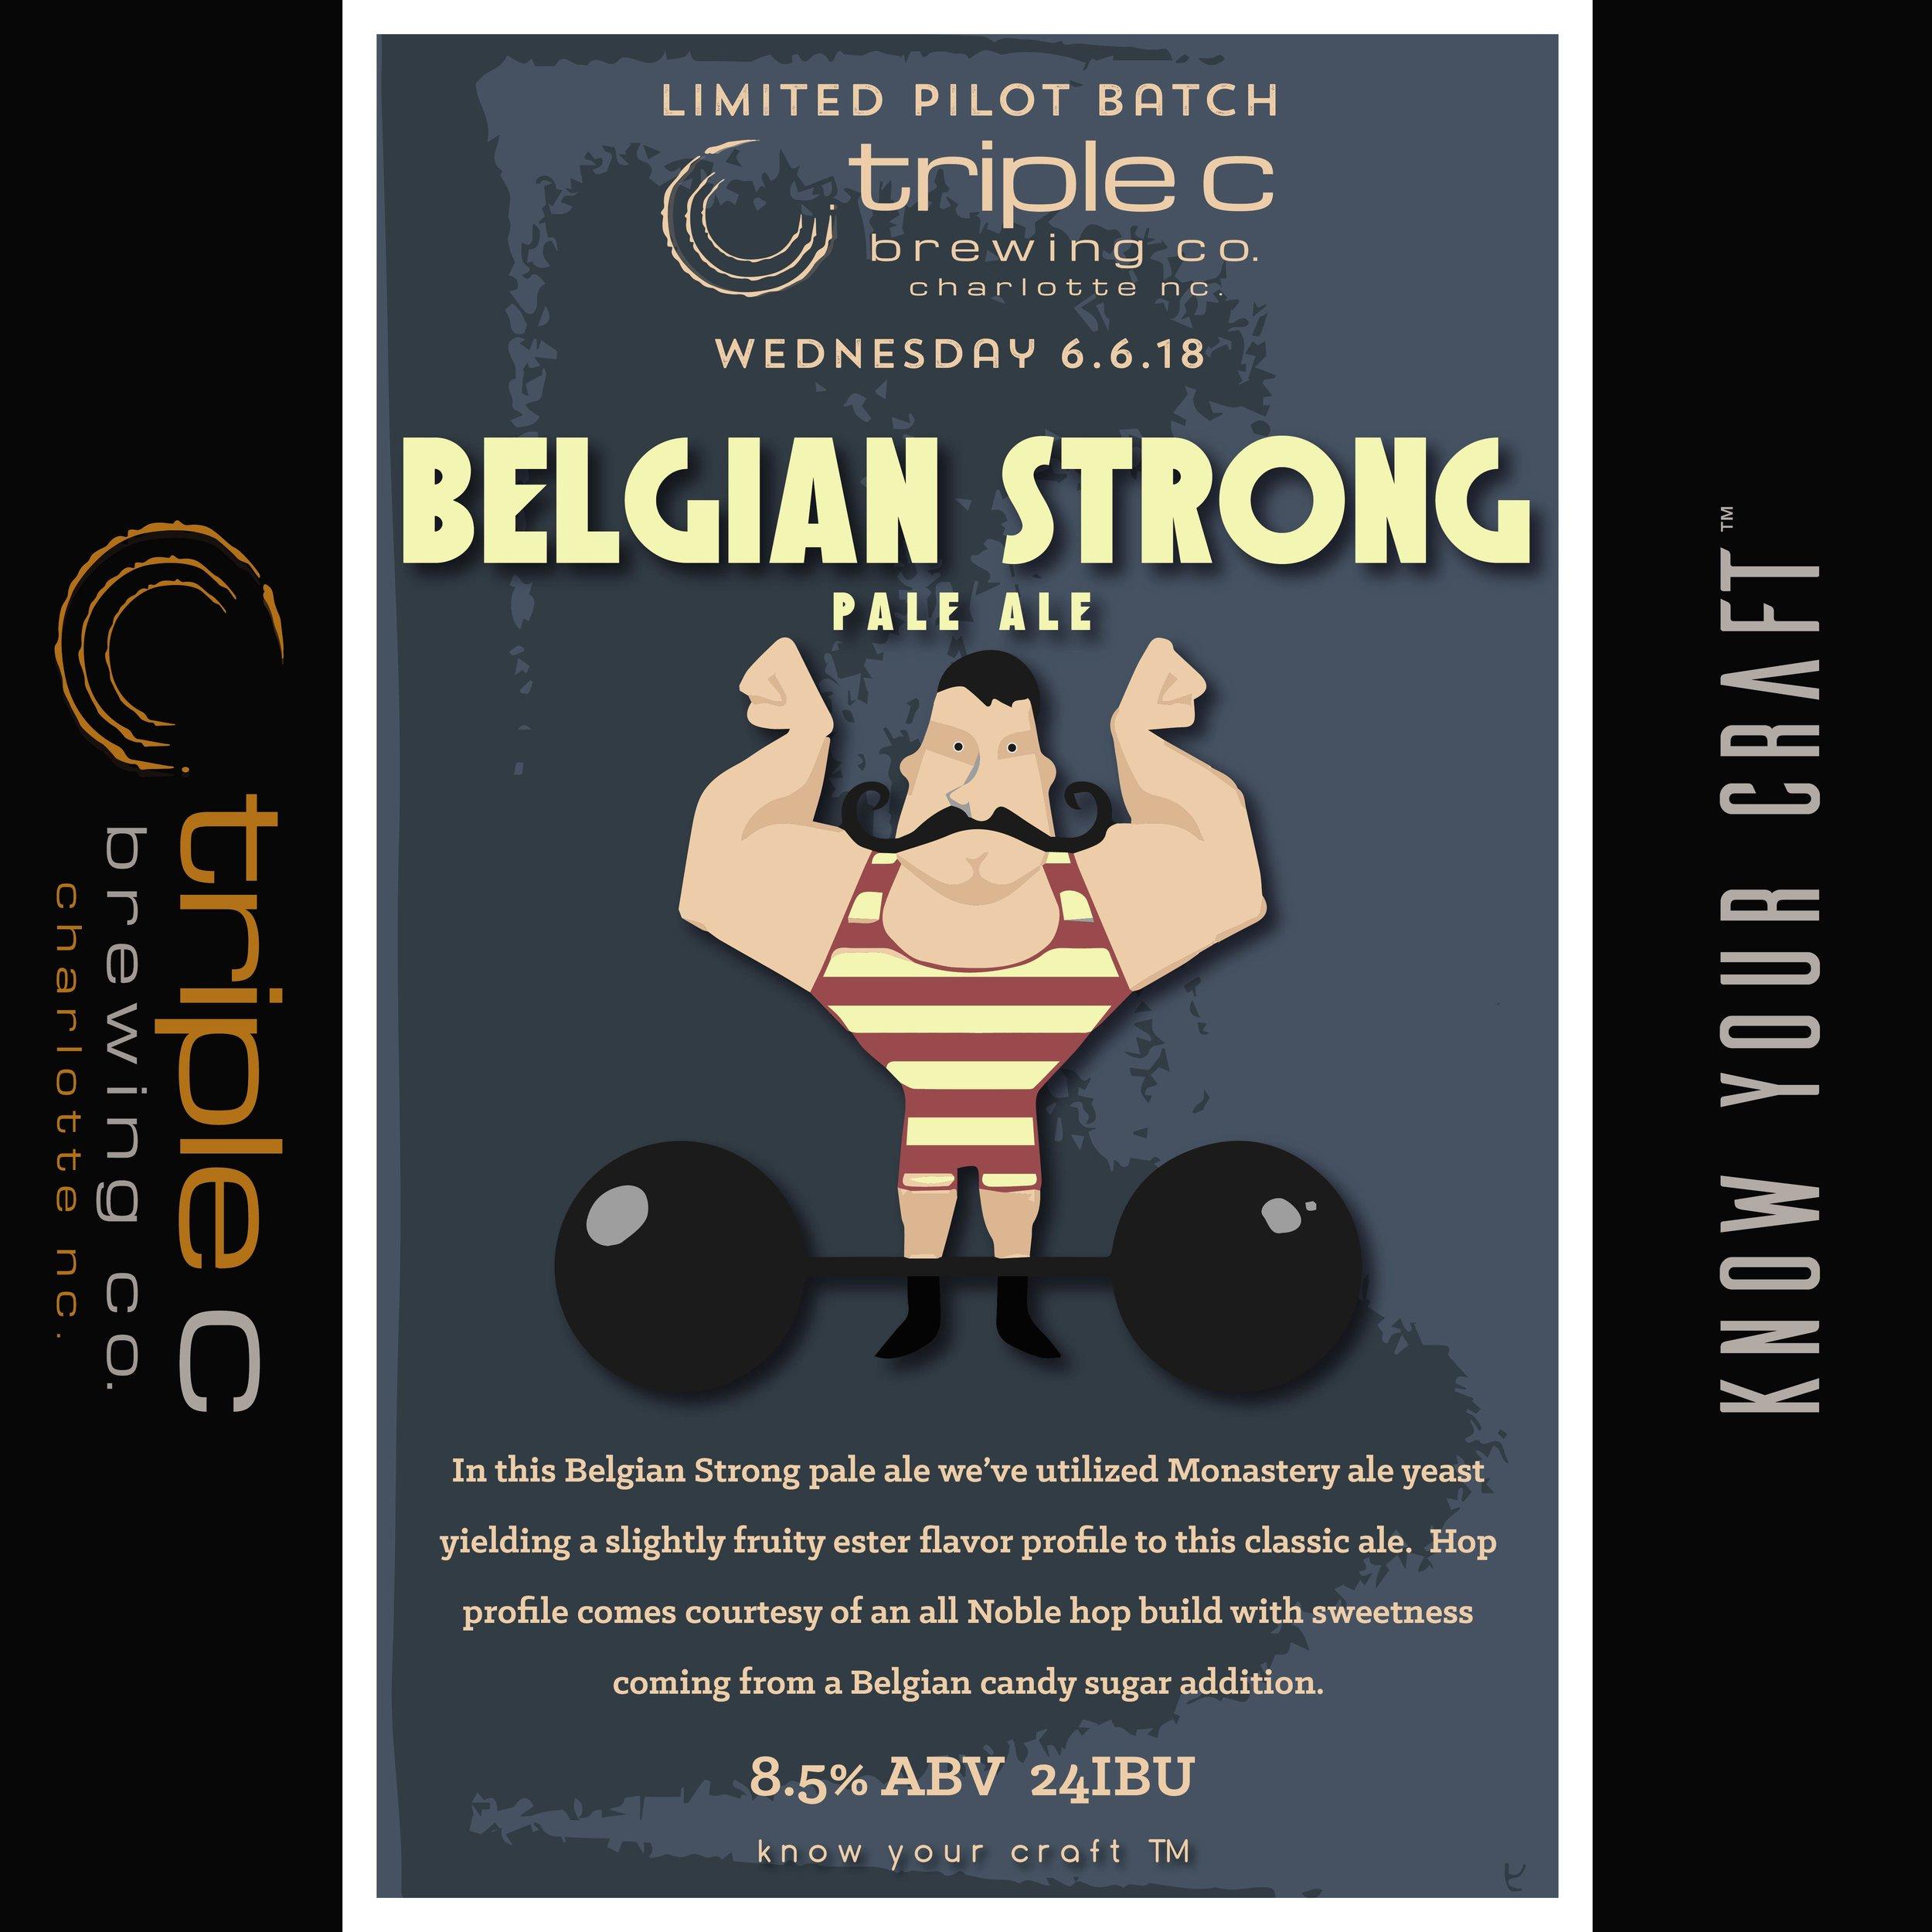 BelgianStrong_Media.jpg